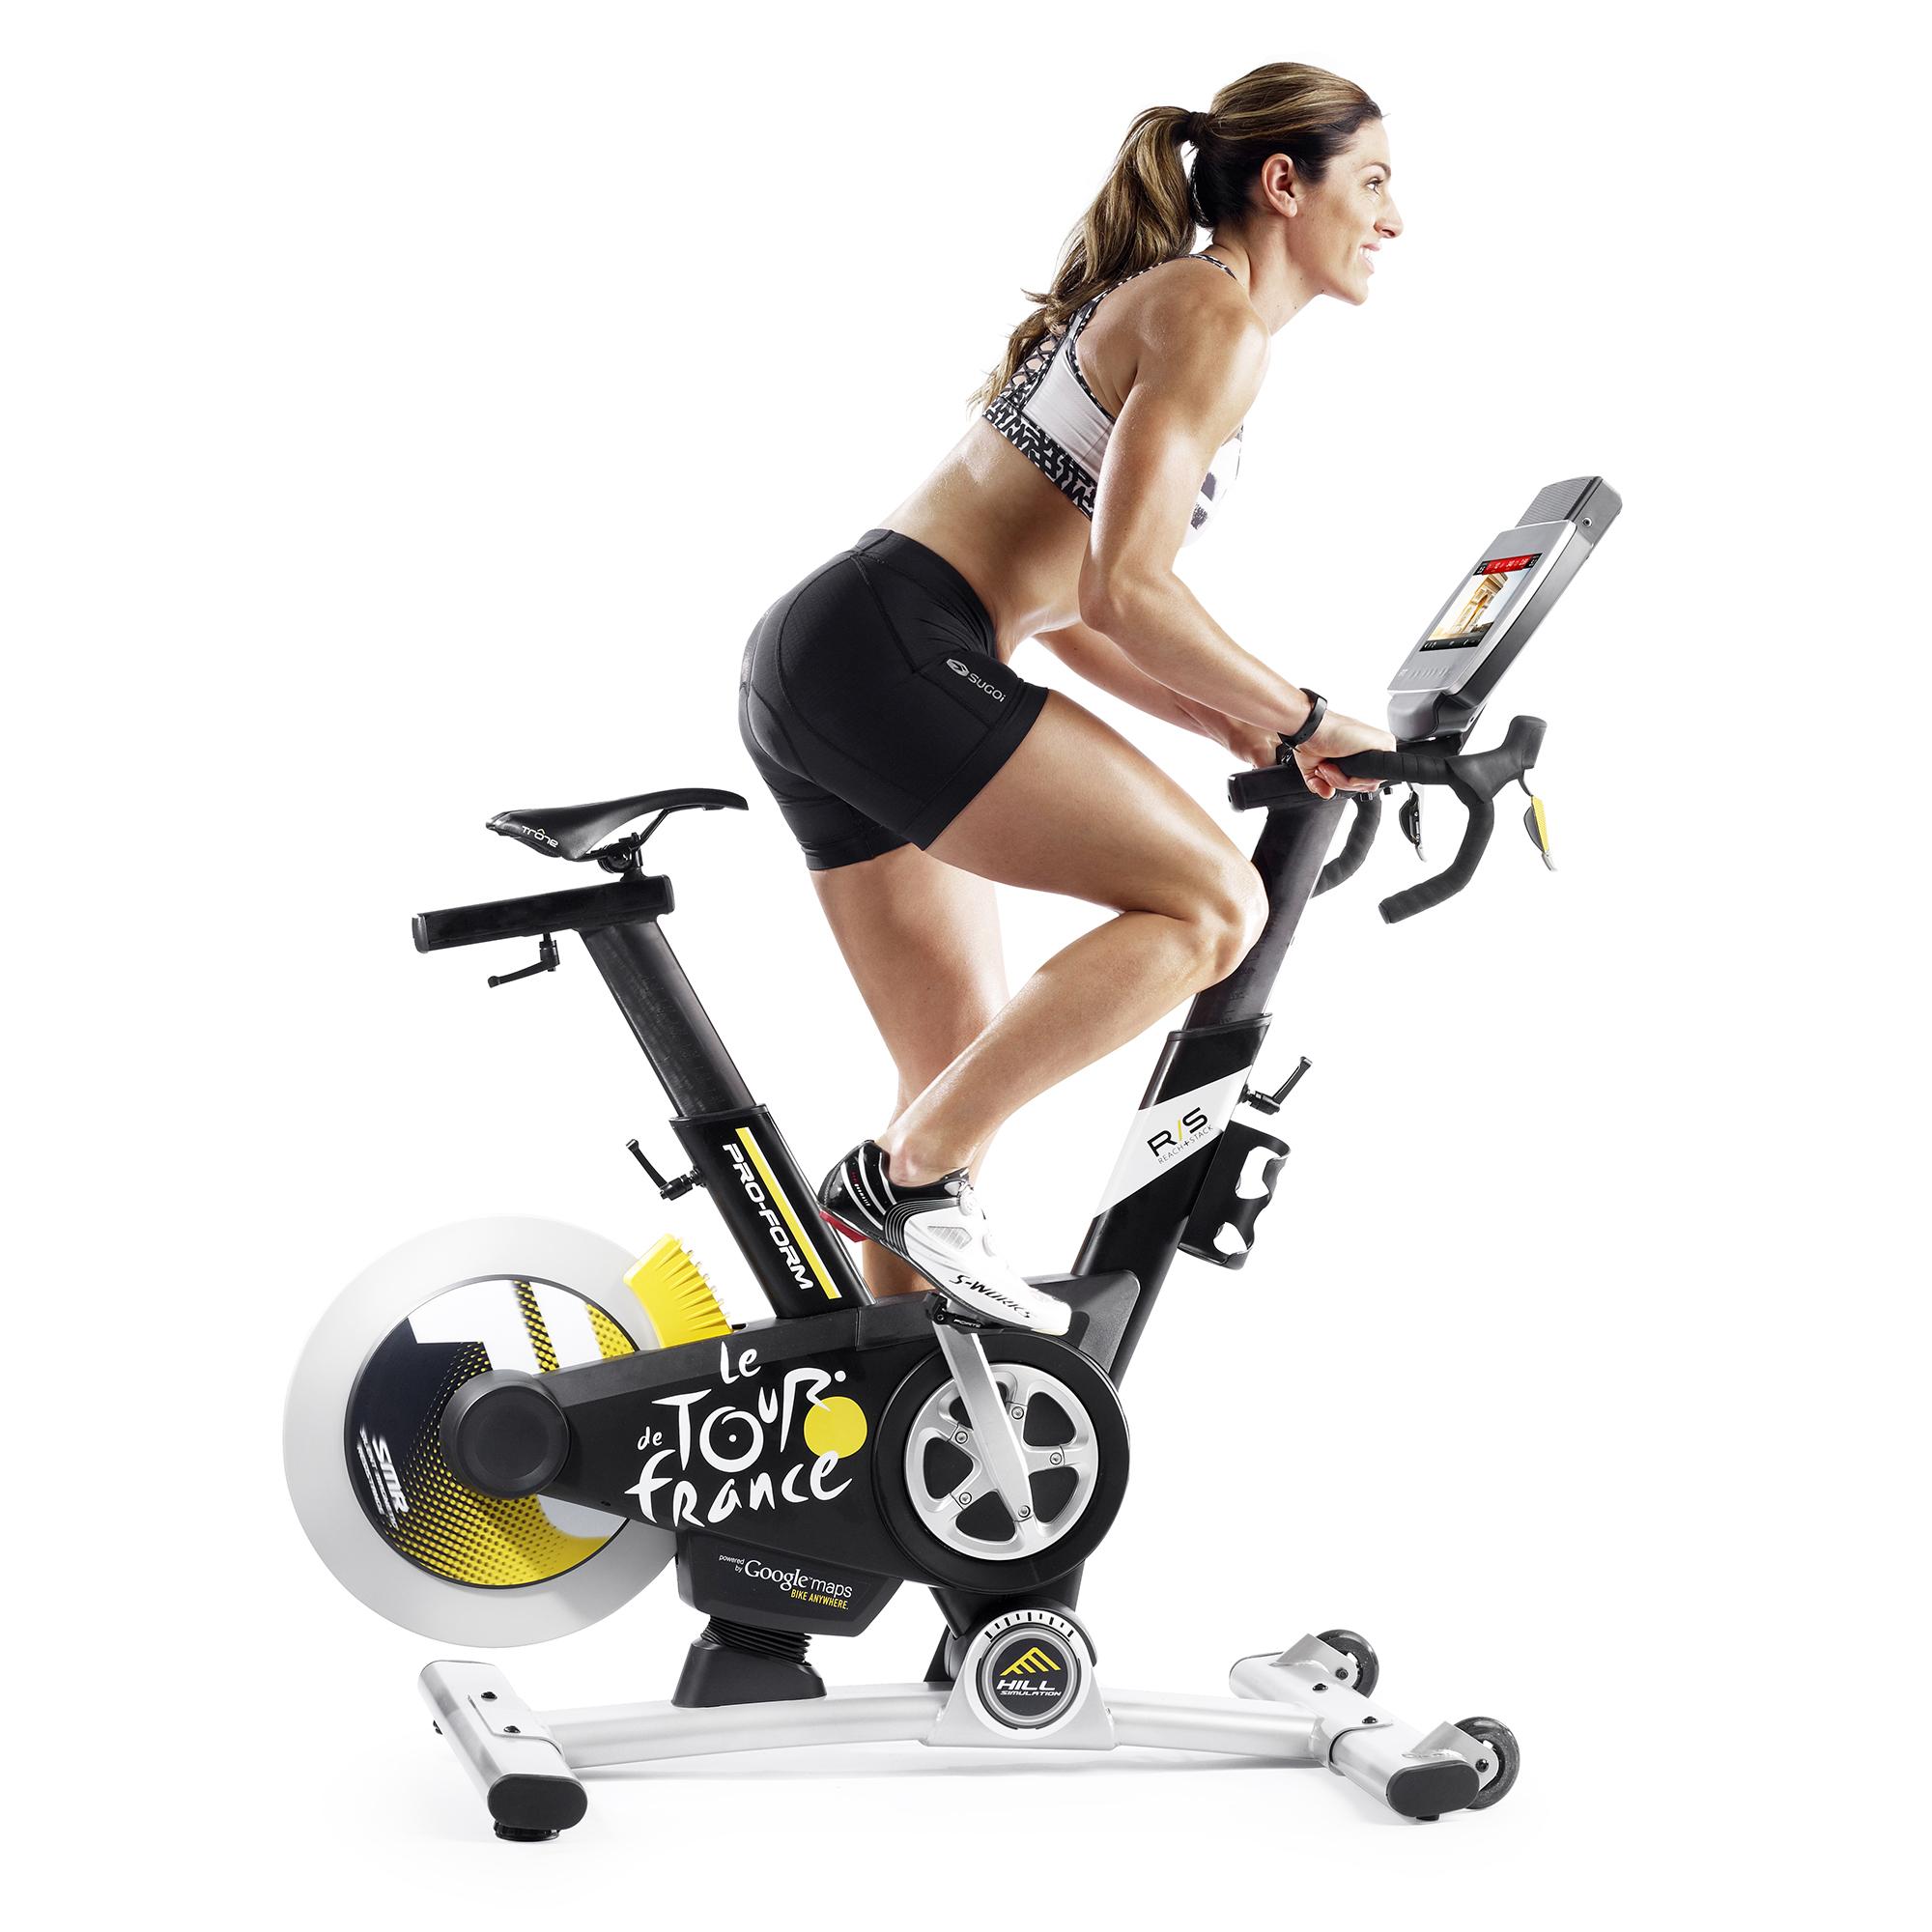 proform le tour de france pro 5 0 home exercise bike w touchscreen bluetooth ebay. Black Bedroom Furniture Sets. Home Design Ideas